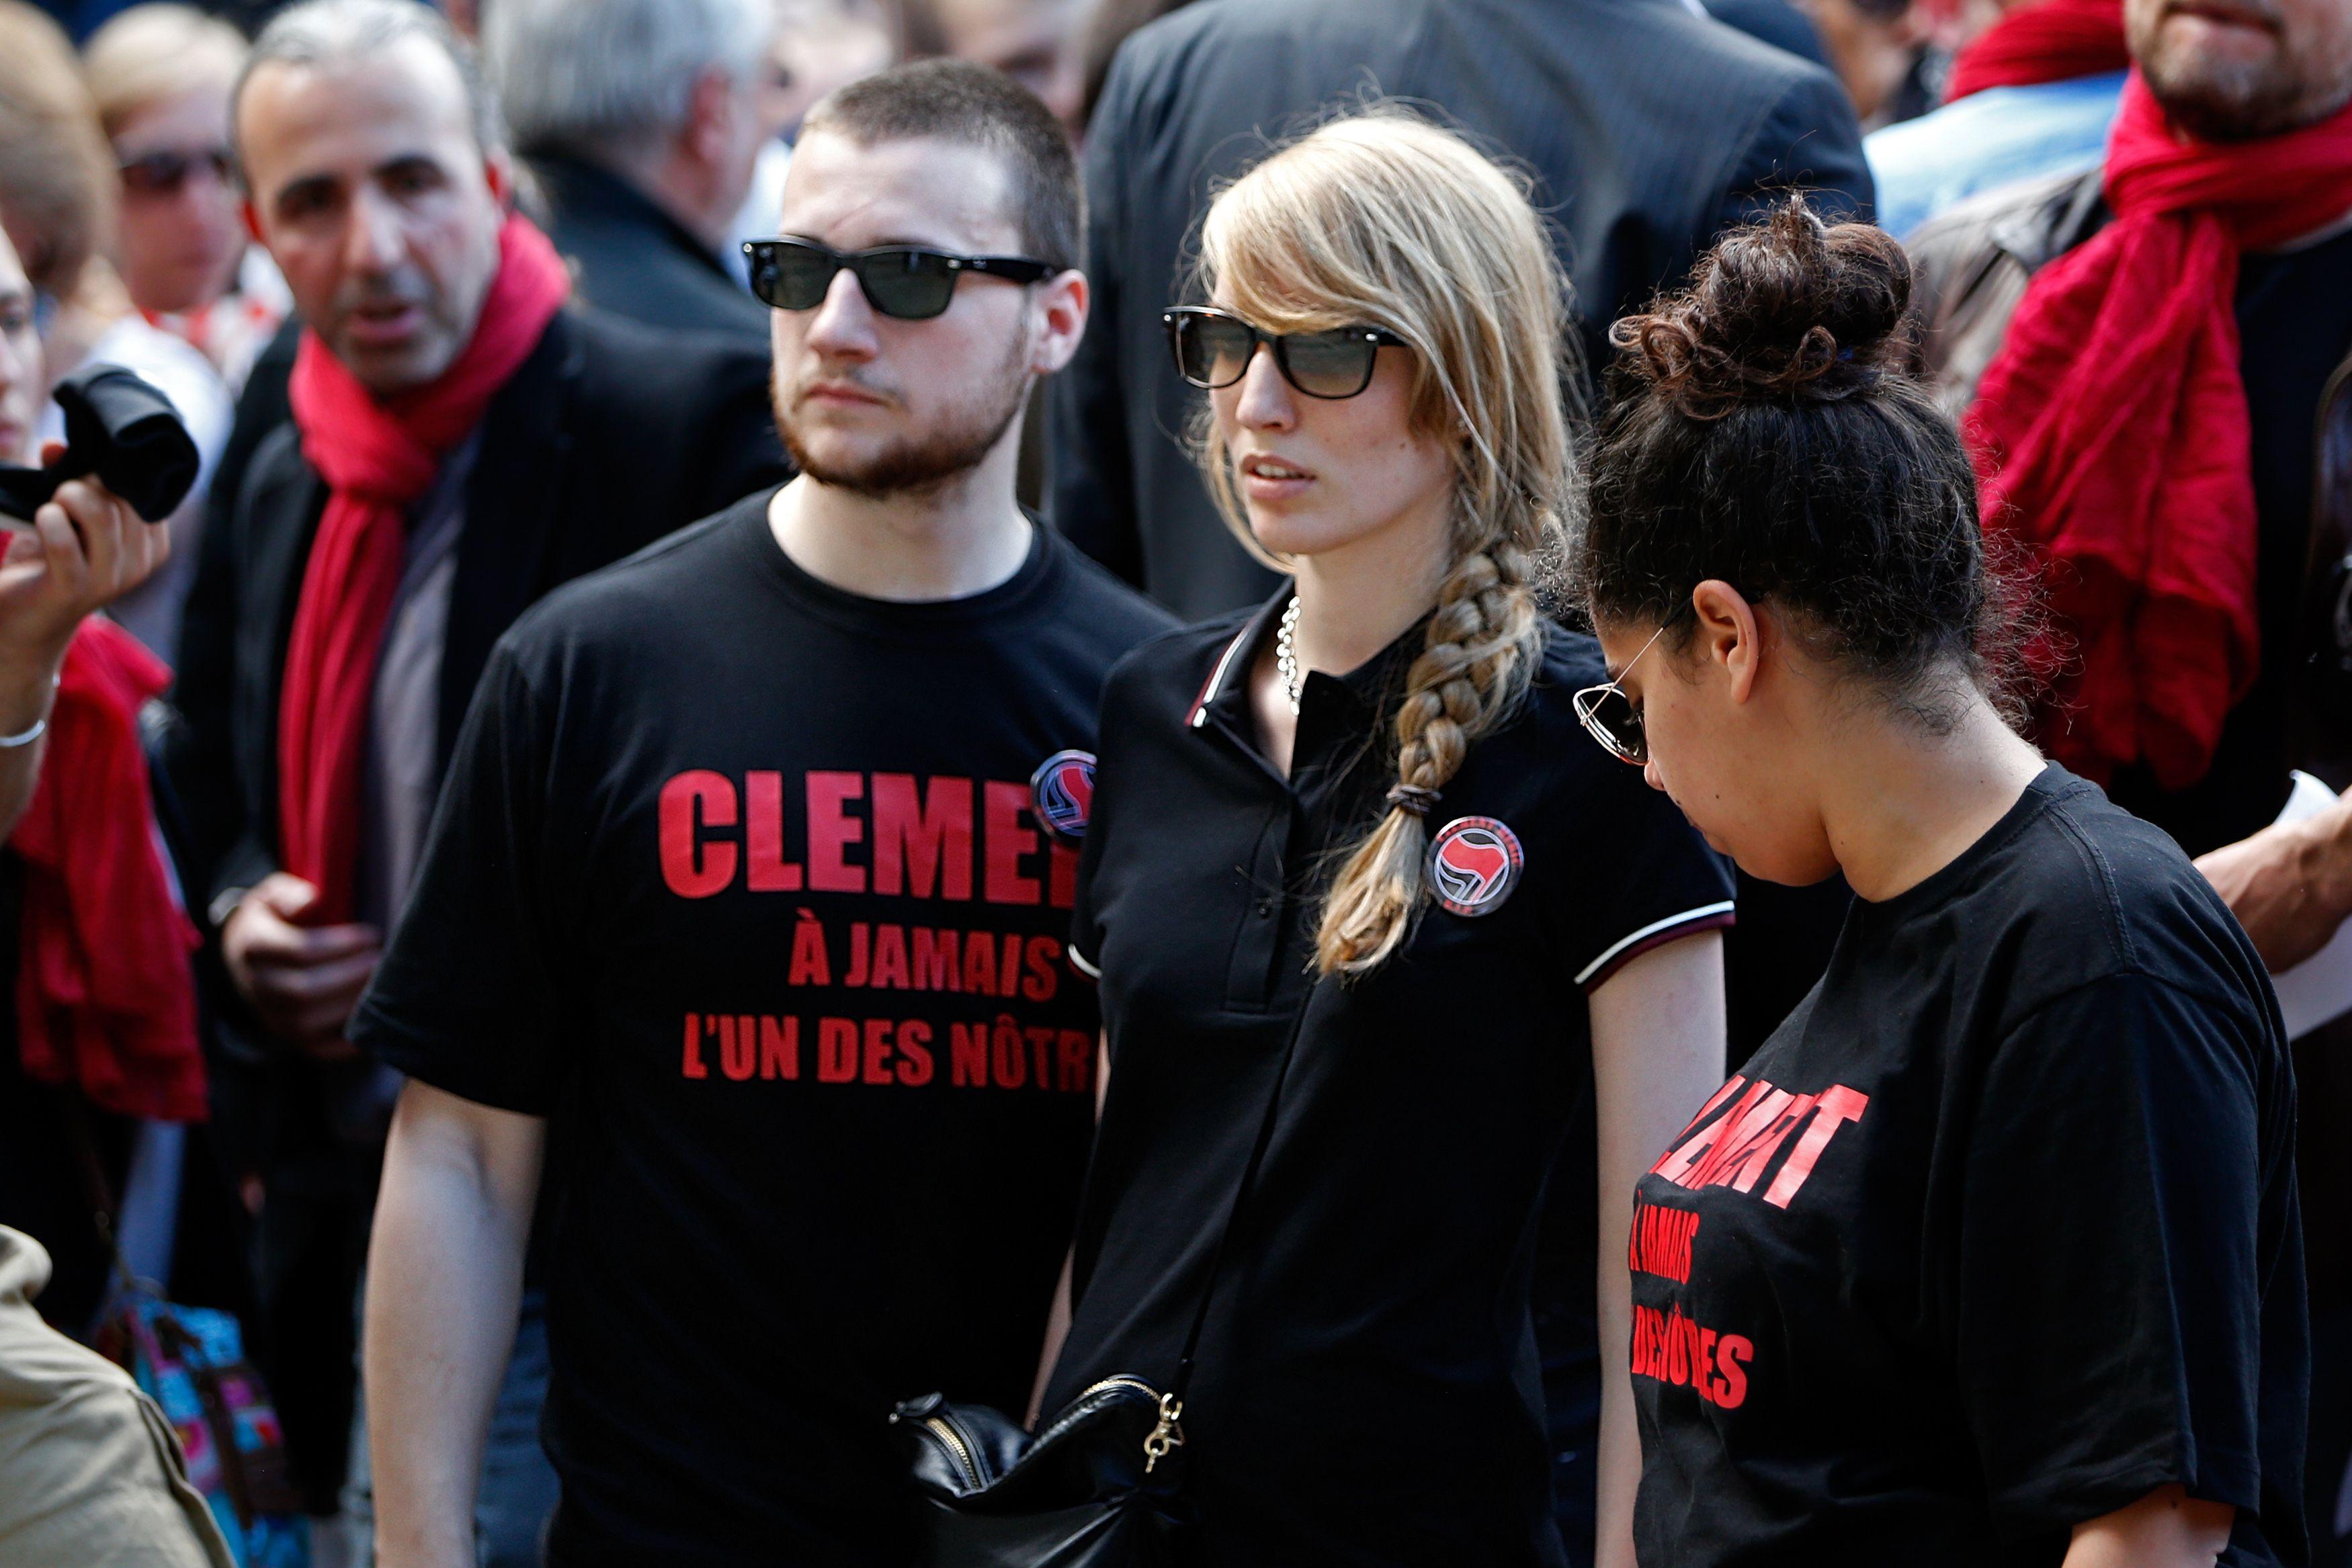 Mort de Clément Méric : un accident selon une vidéo de la RATP